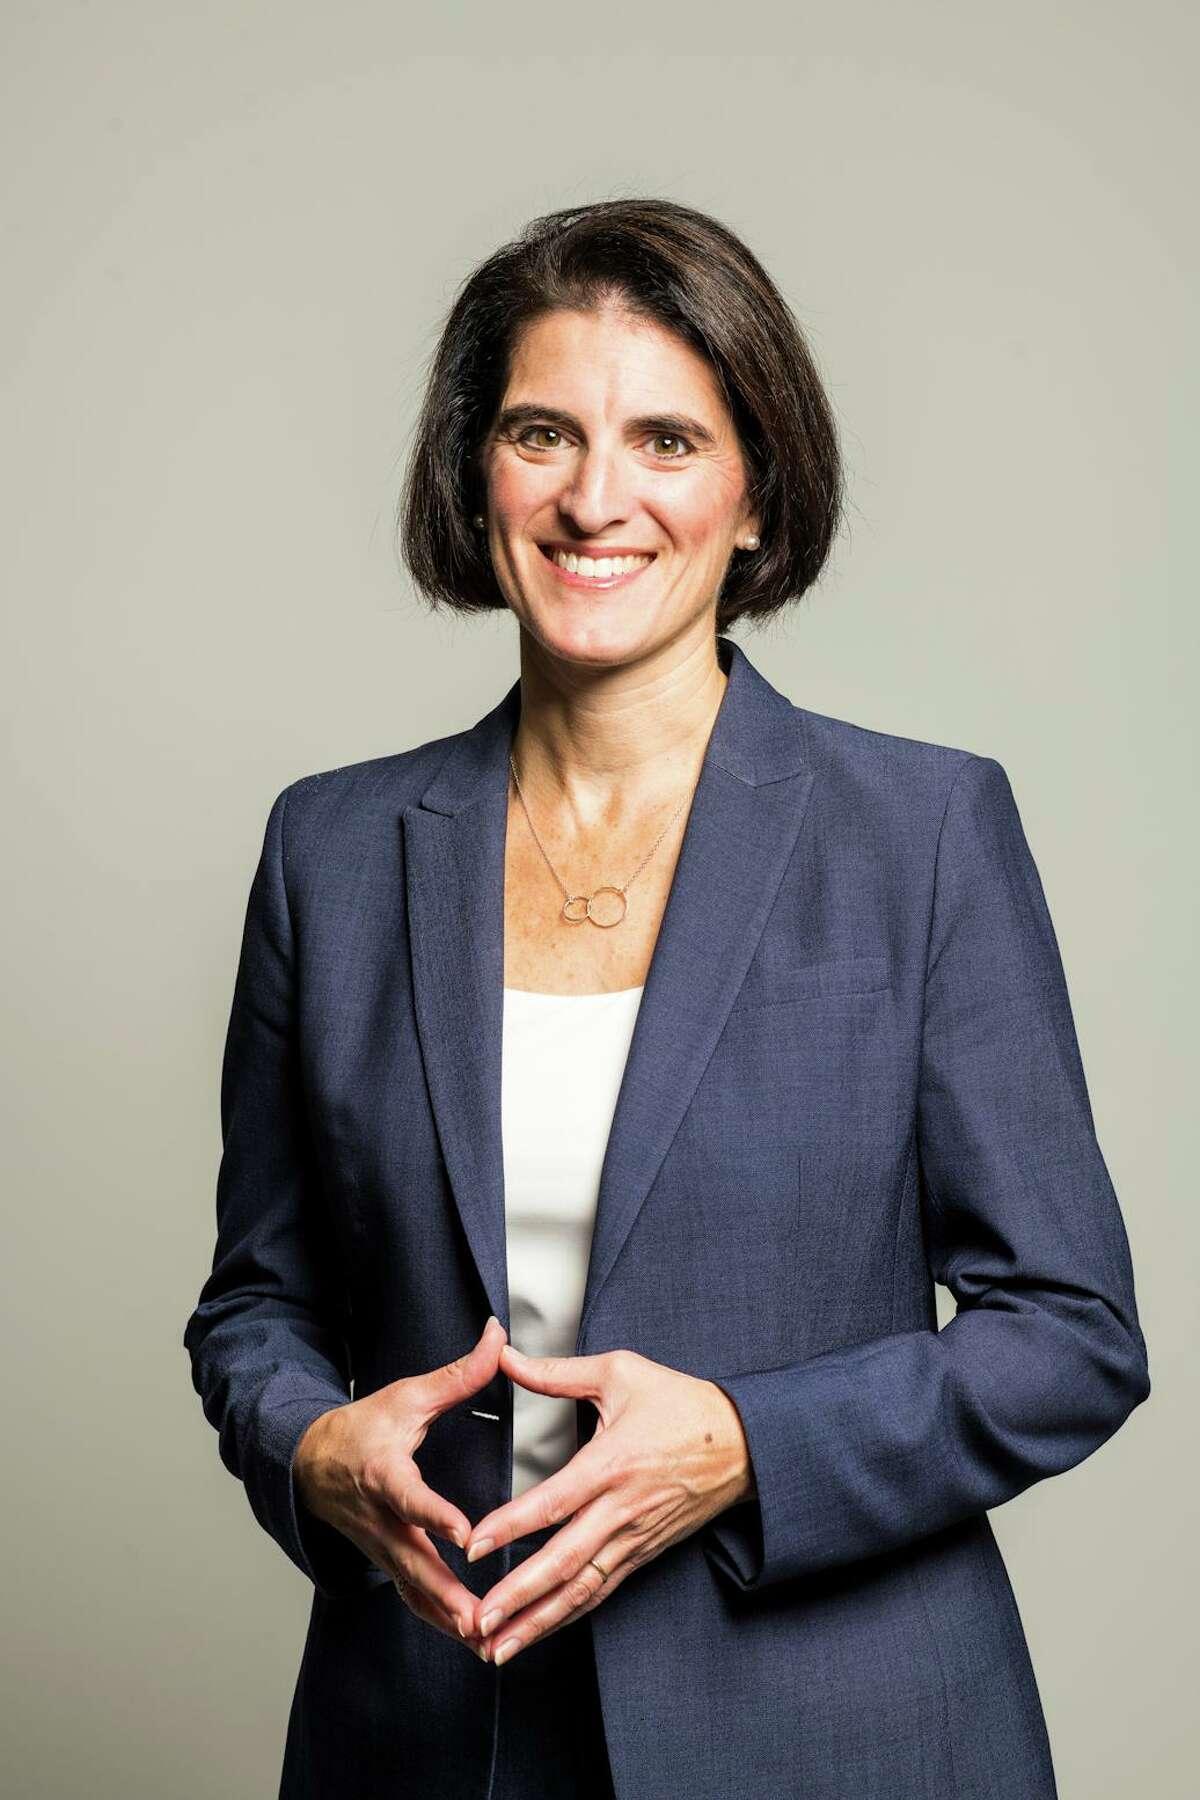 State Rep. Cristin McCarthy Vahey (D-133)